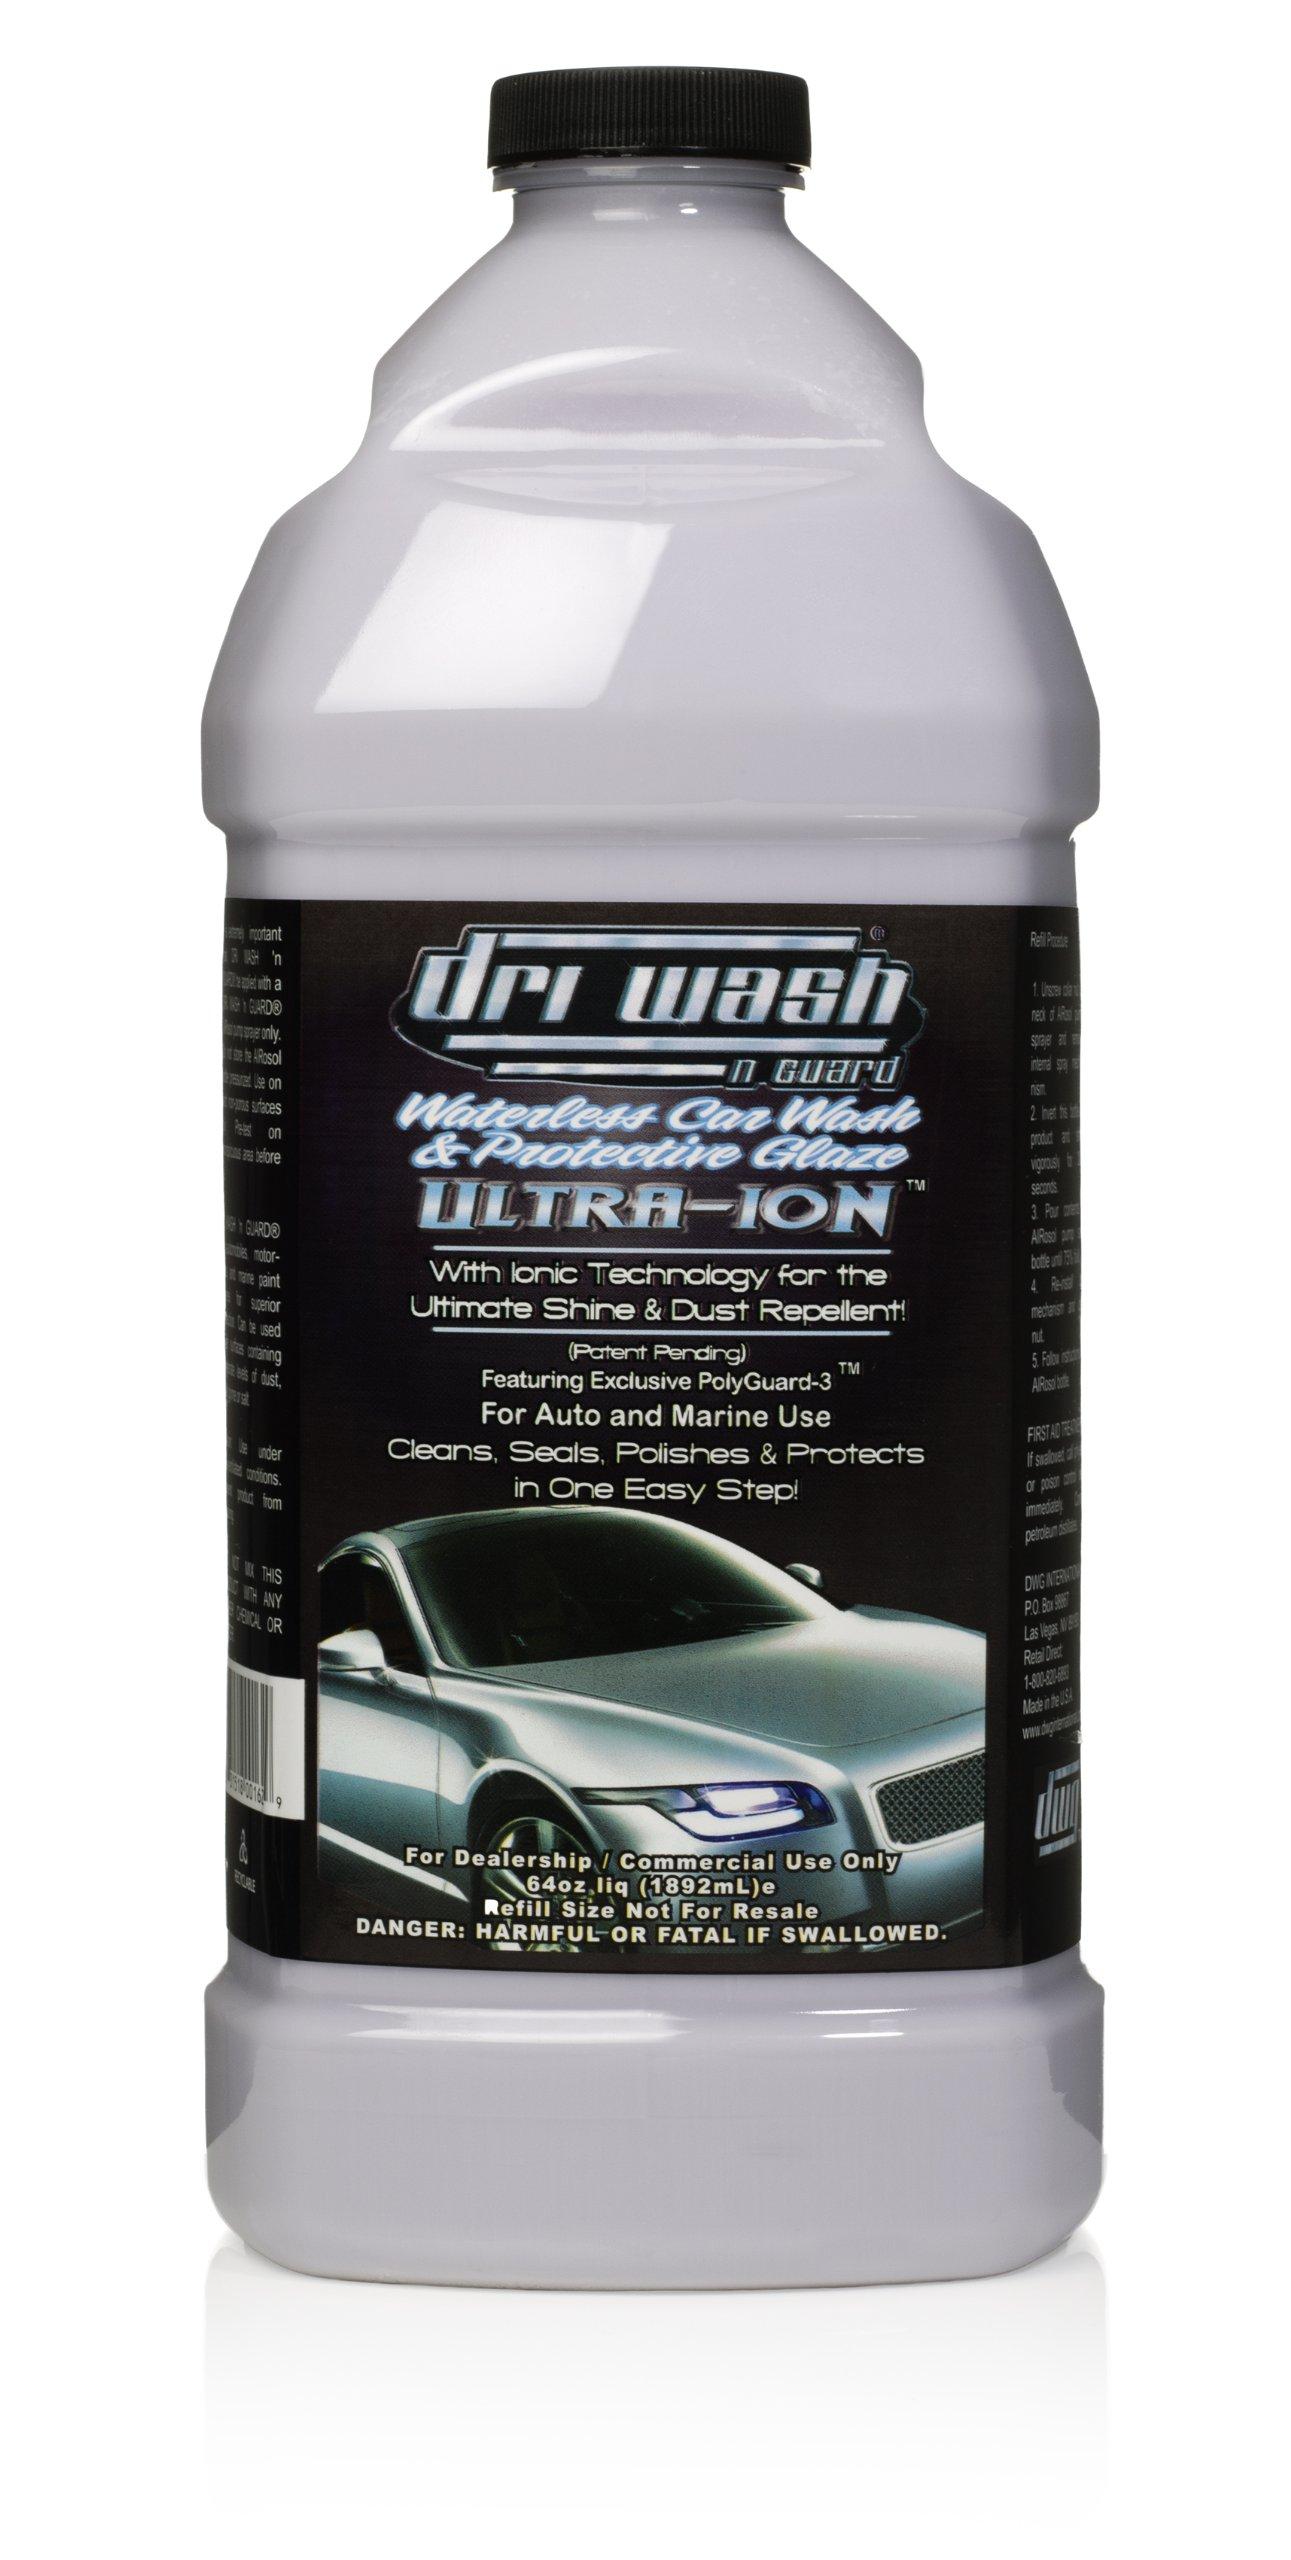 64oz Dri Wash 'n Guard ULTRA-ION Waterless Car Wash